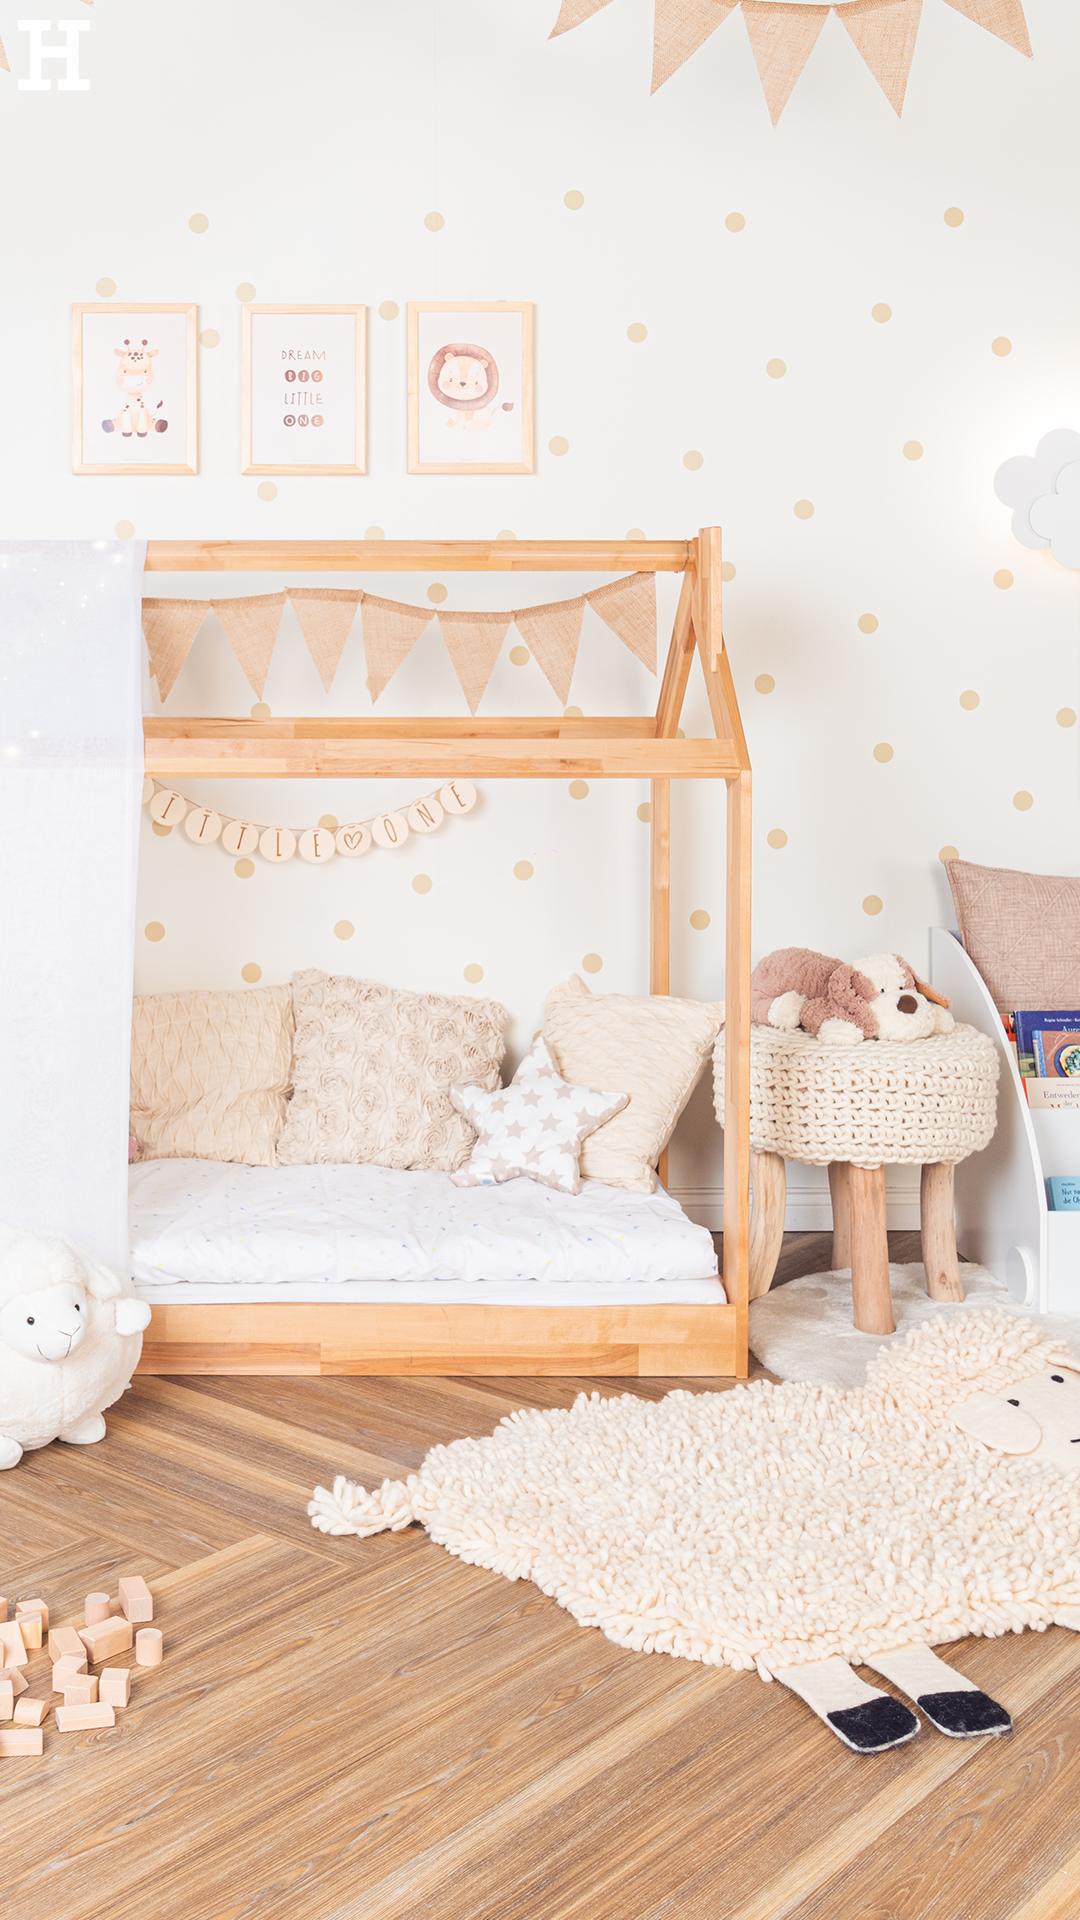 Kinderzimmer Kinder zimmer, Kinderzimmer und